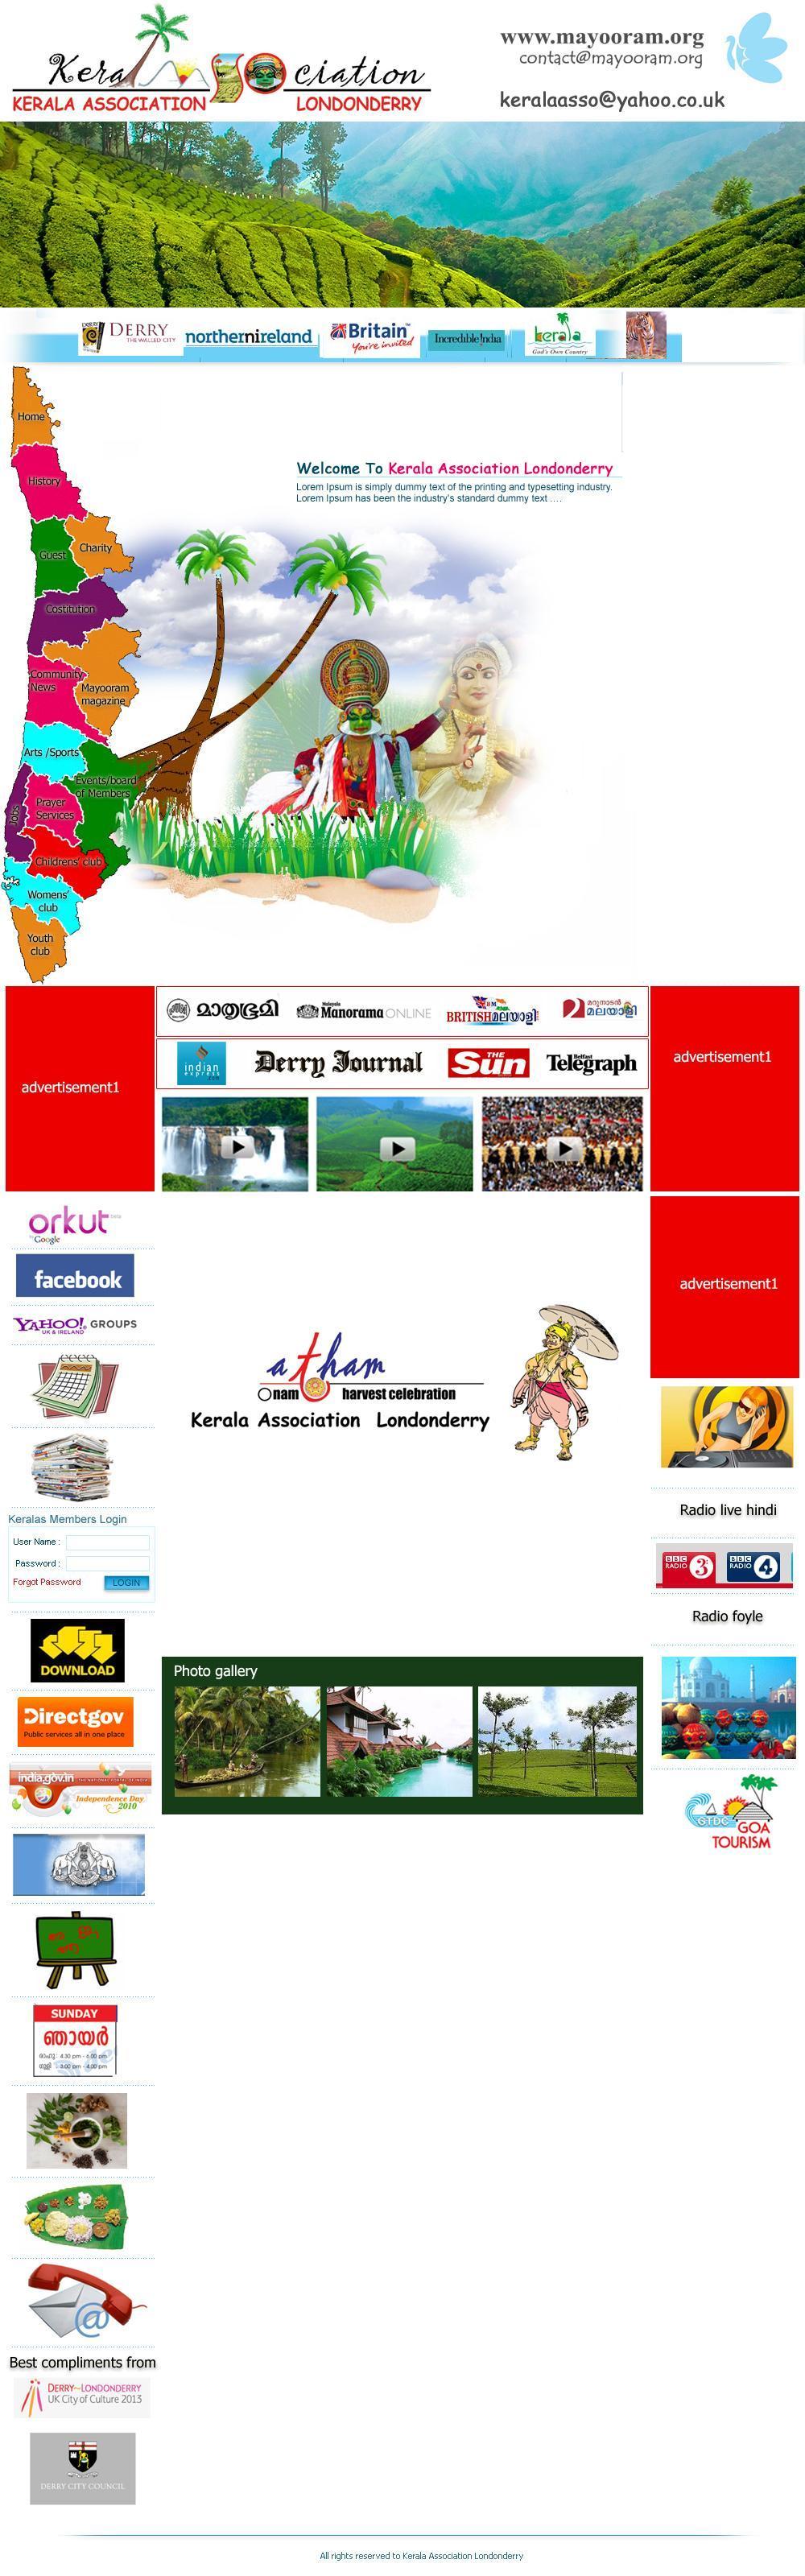 kerala association